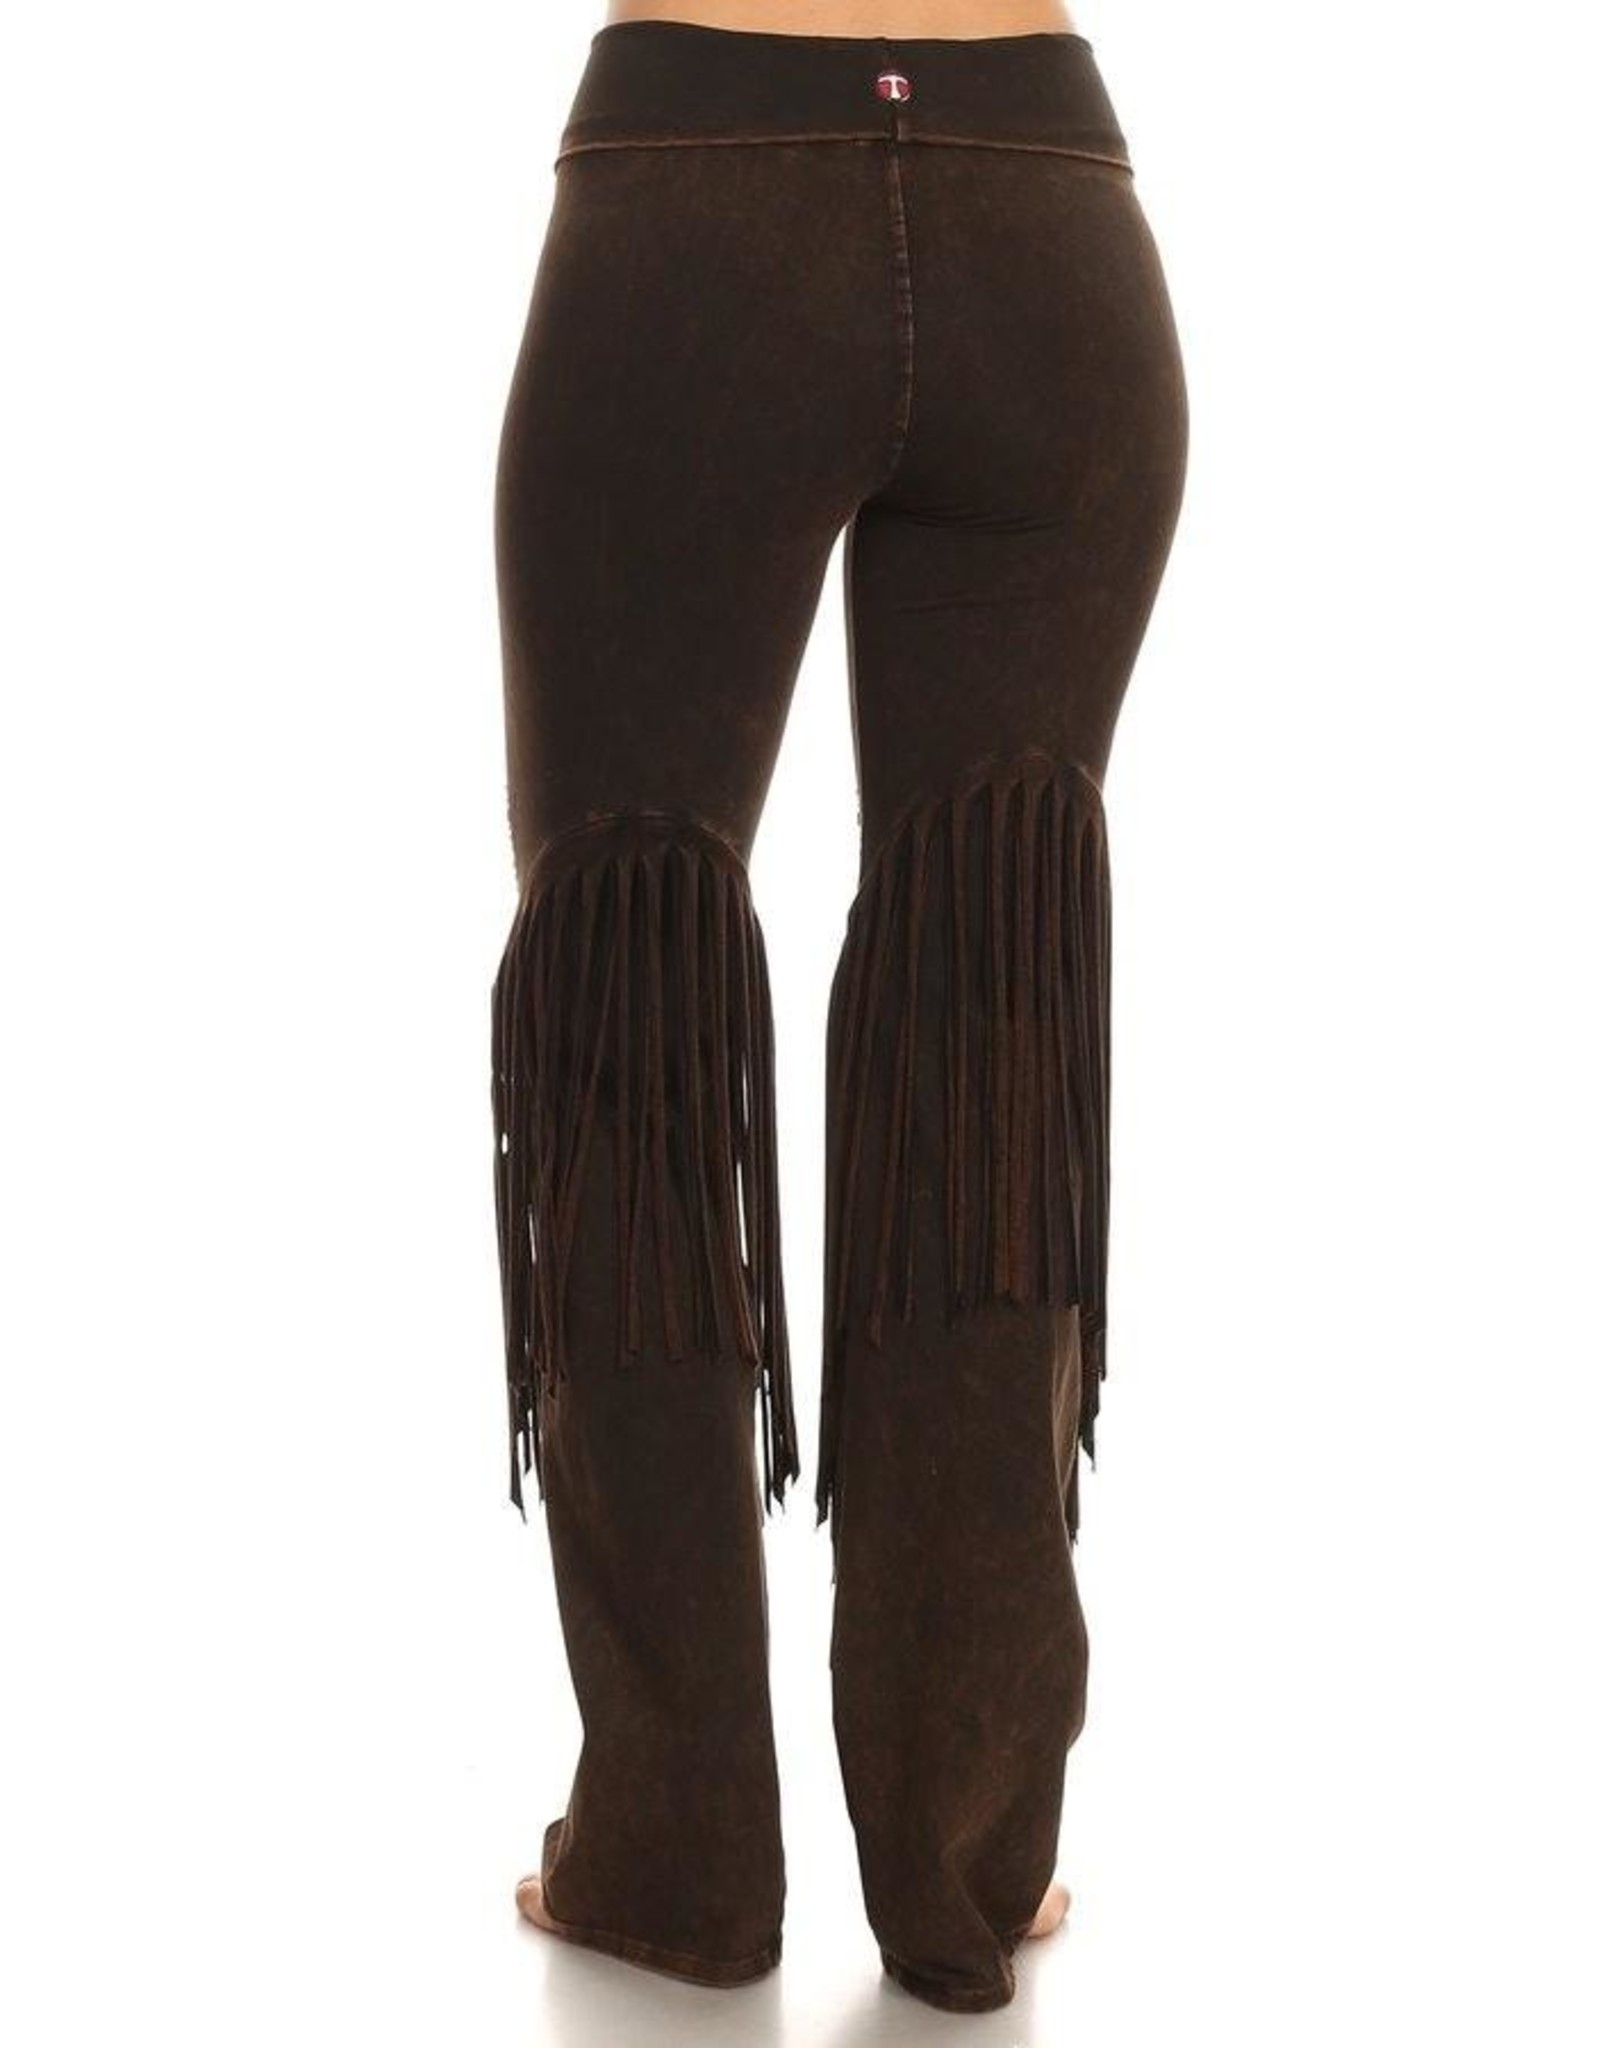 Stone Design Fringe Detail Yoga Pants